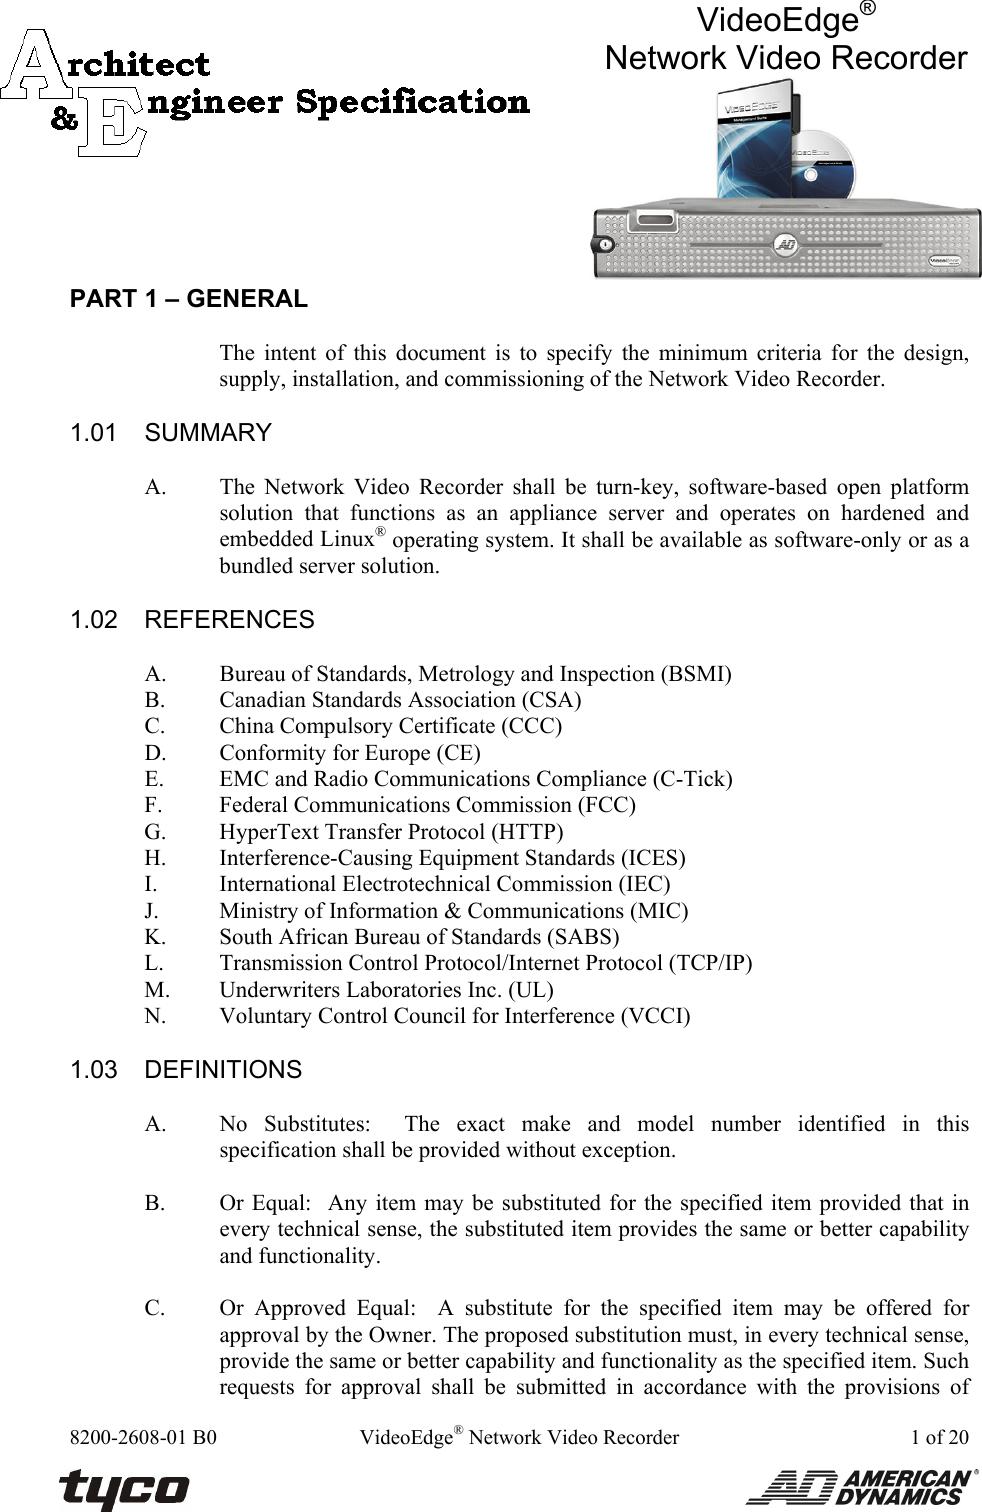 American Dynamics Videoedge Adnsnvr Cl1 Users Manual NVR